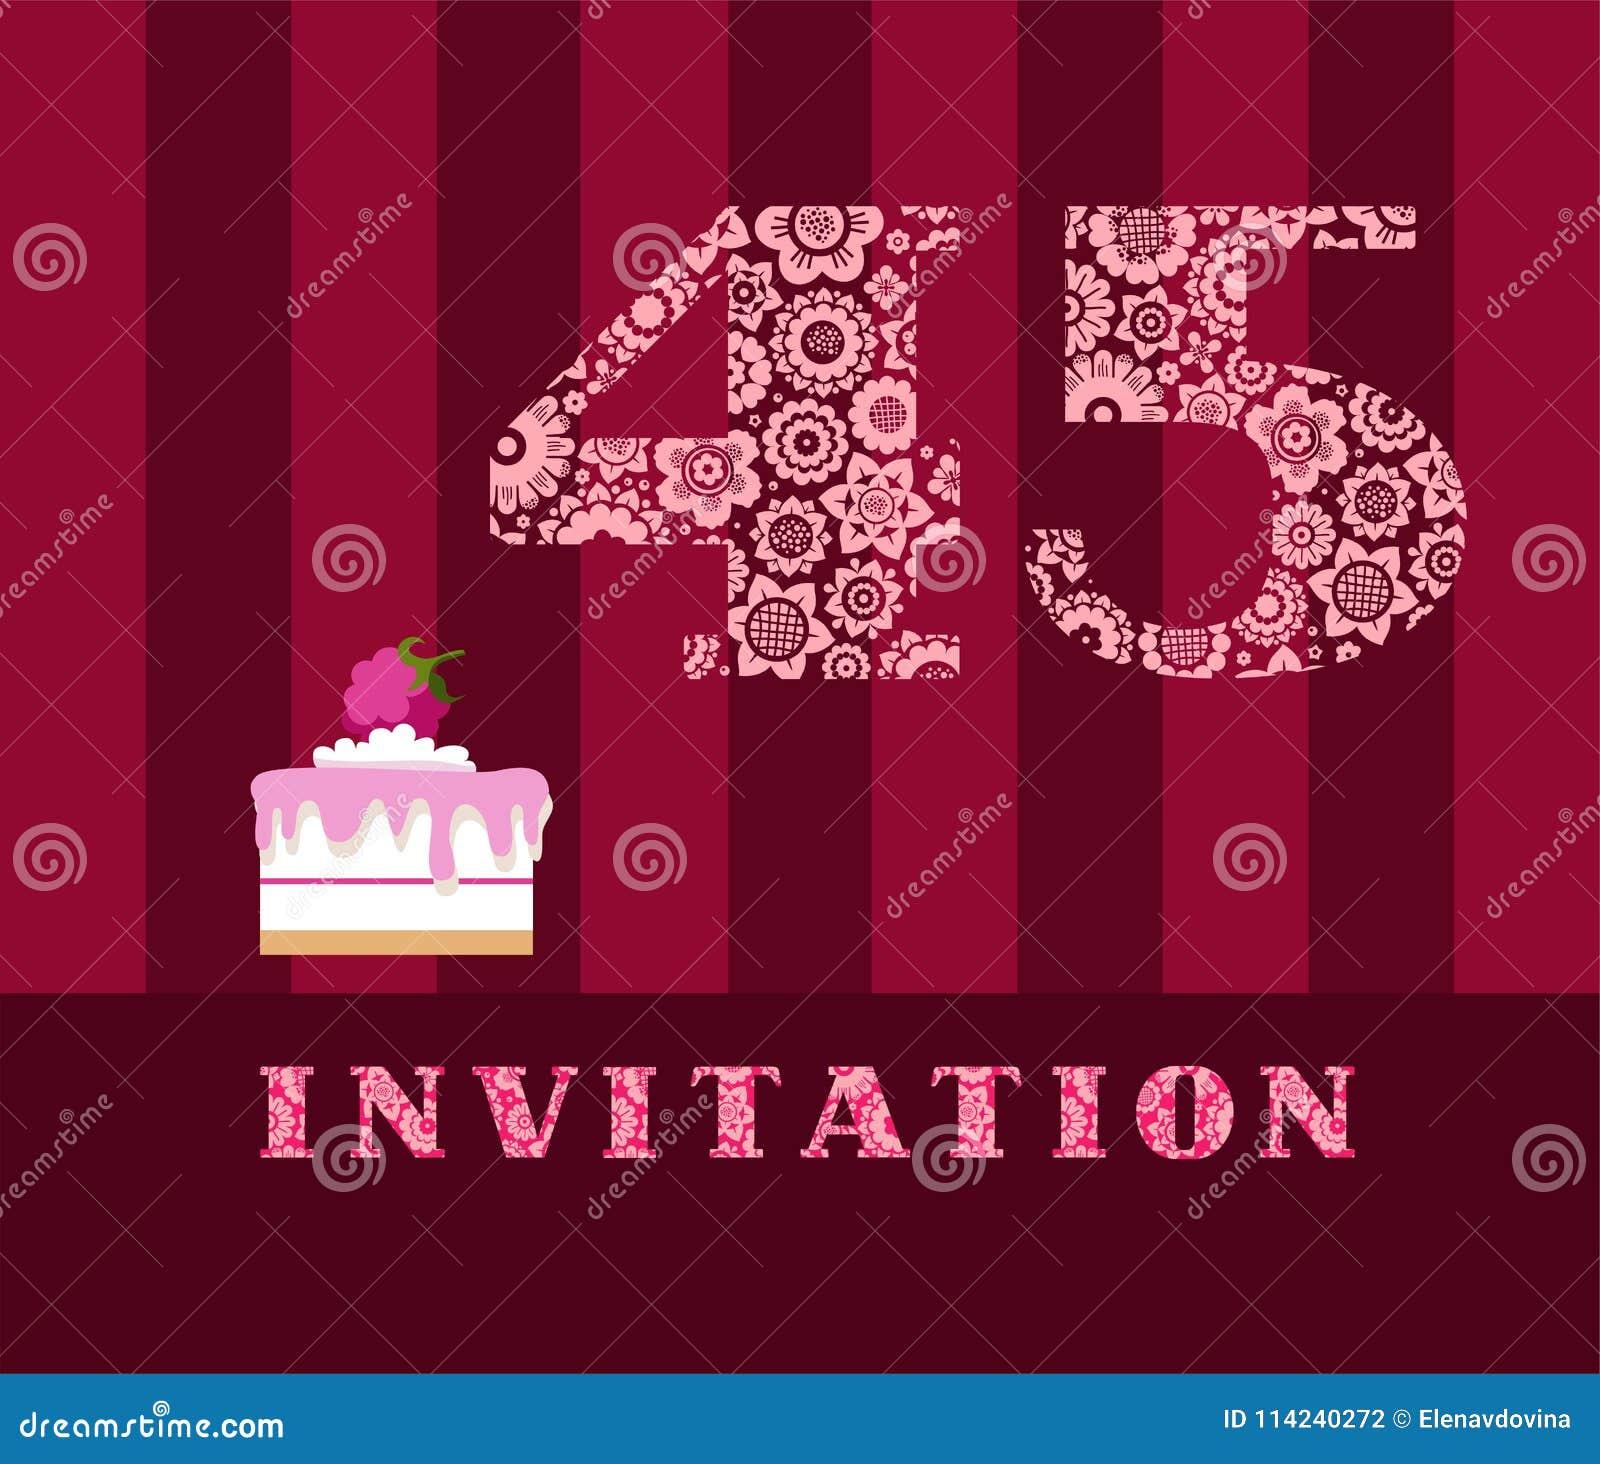 Invitation 45 Years Old Raspberry Pie Vector English